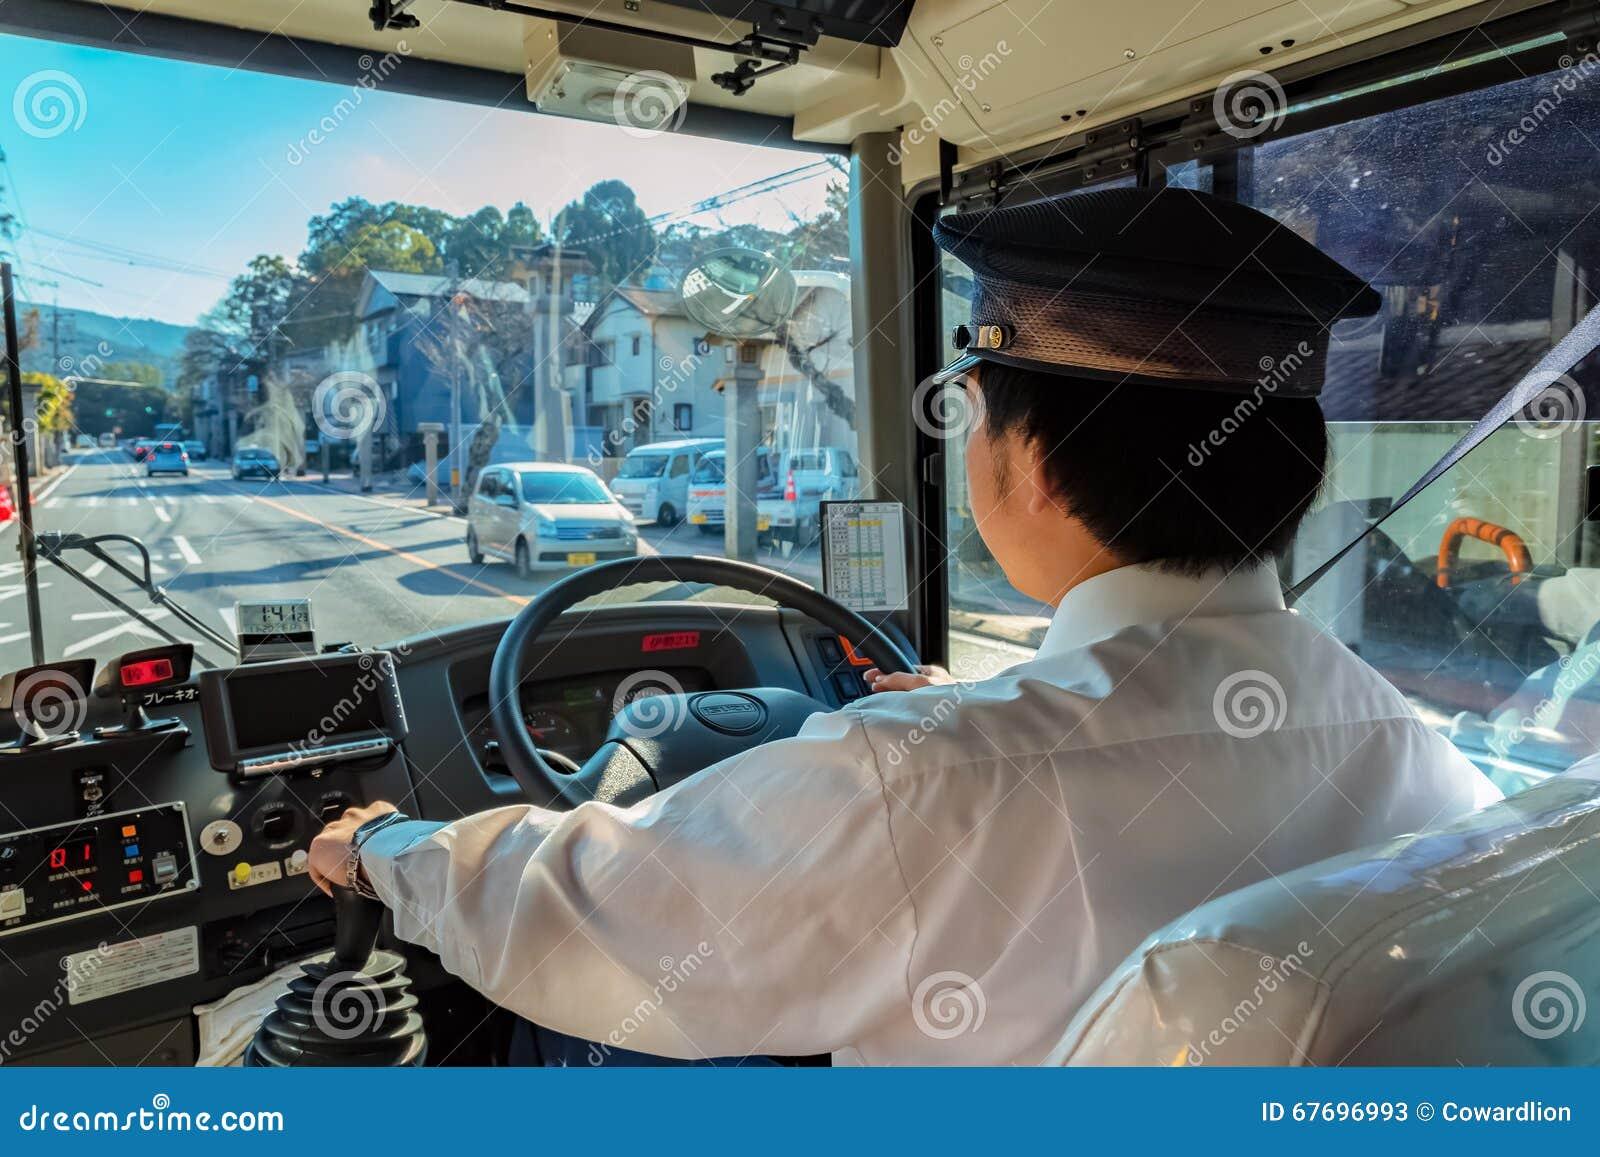 Um condutor de ônibus japonês em Ise City, Mie Prefecture, Japão